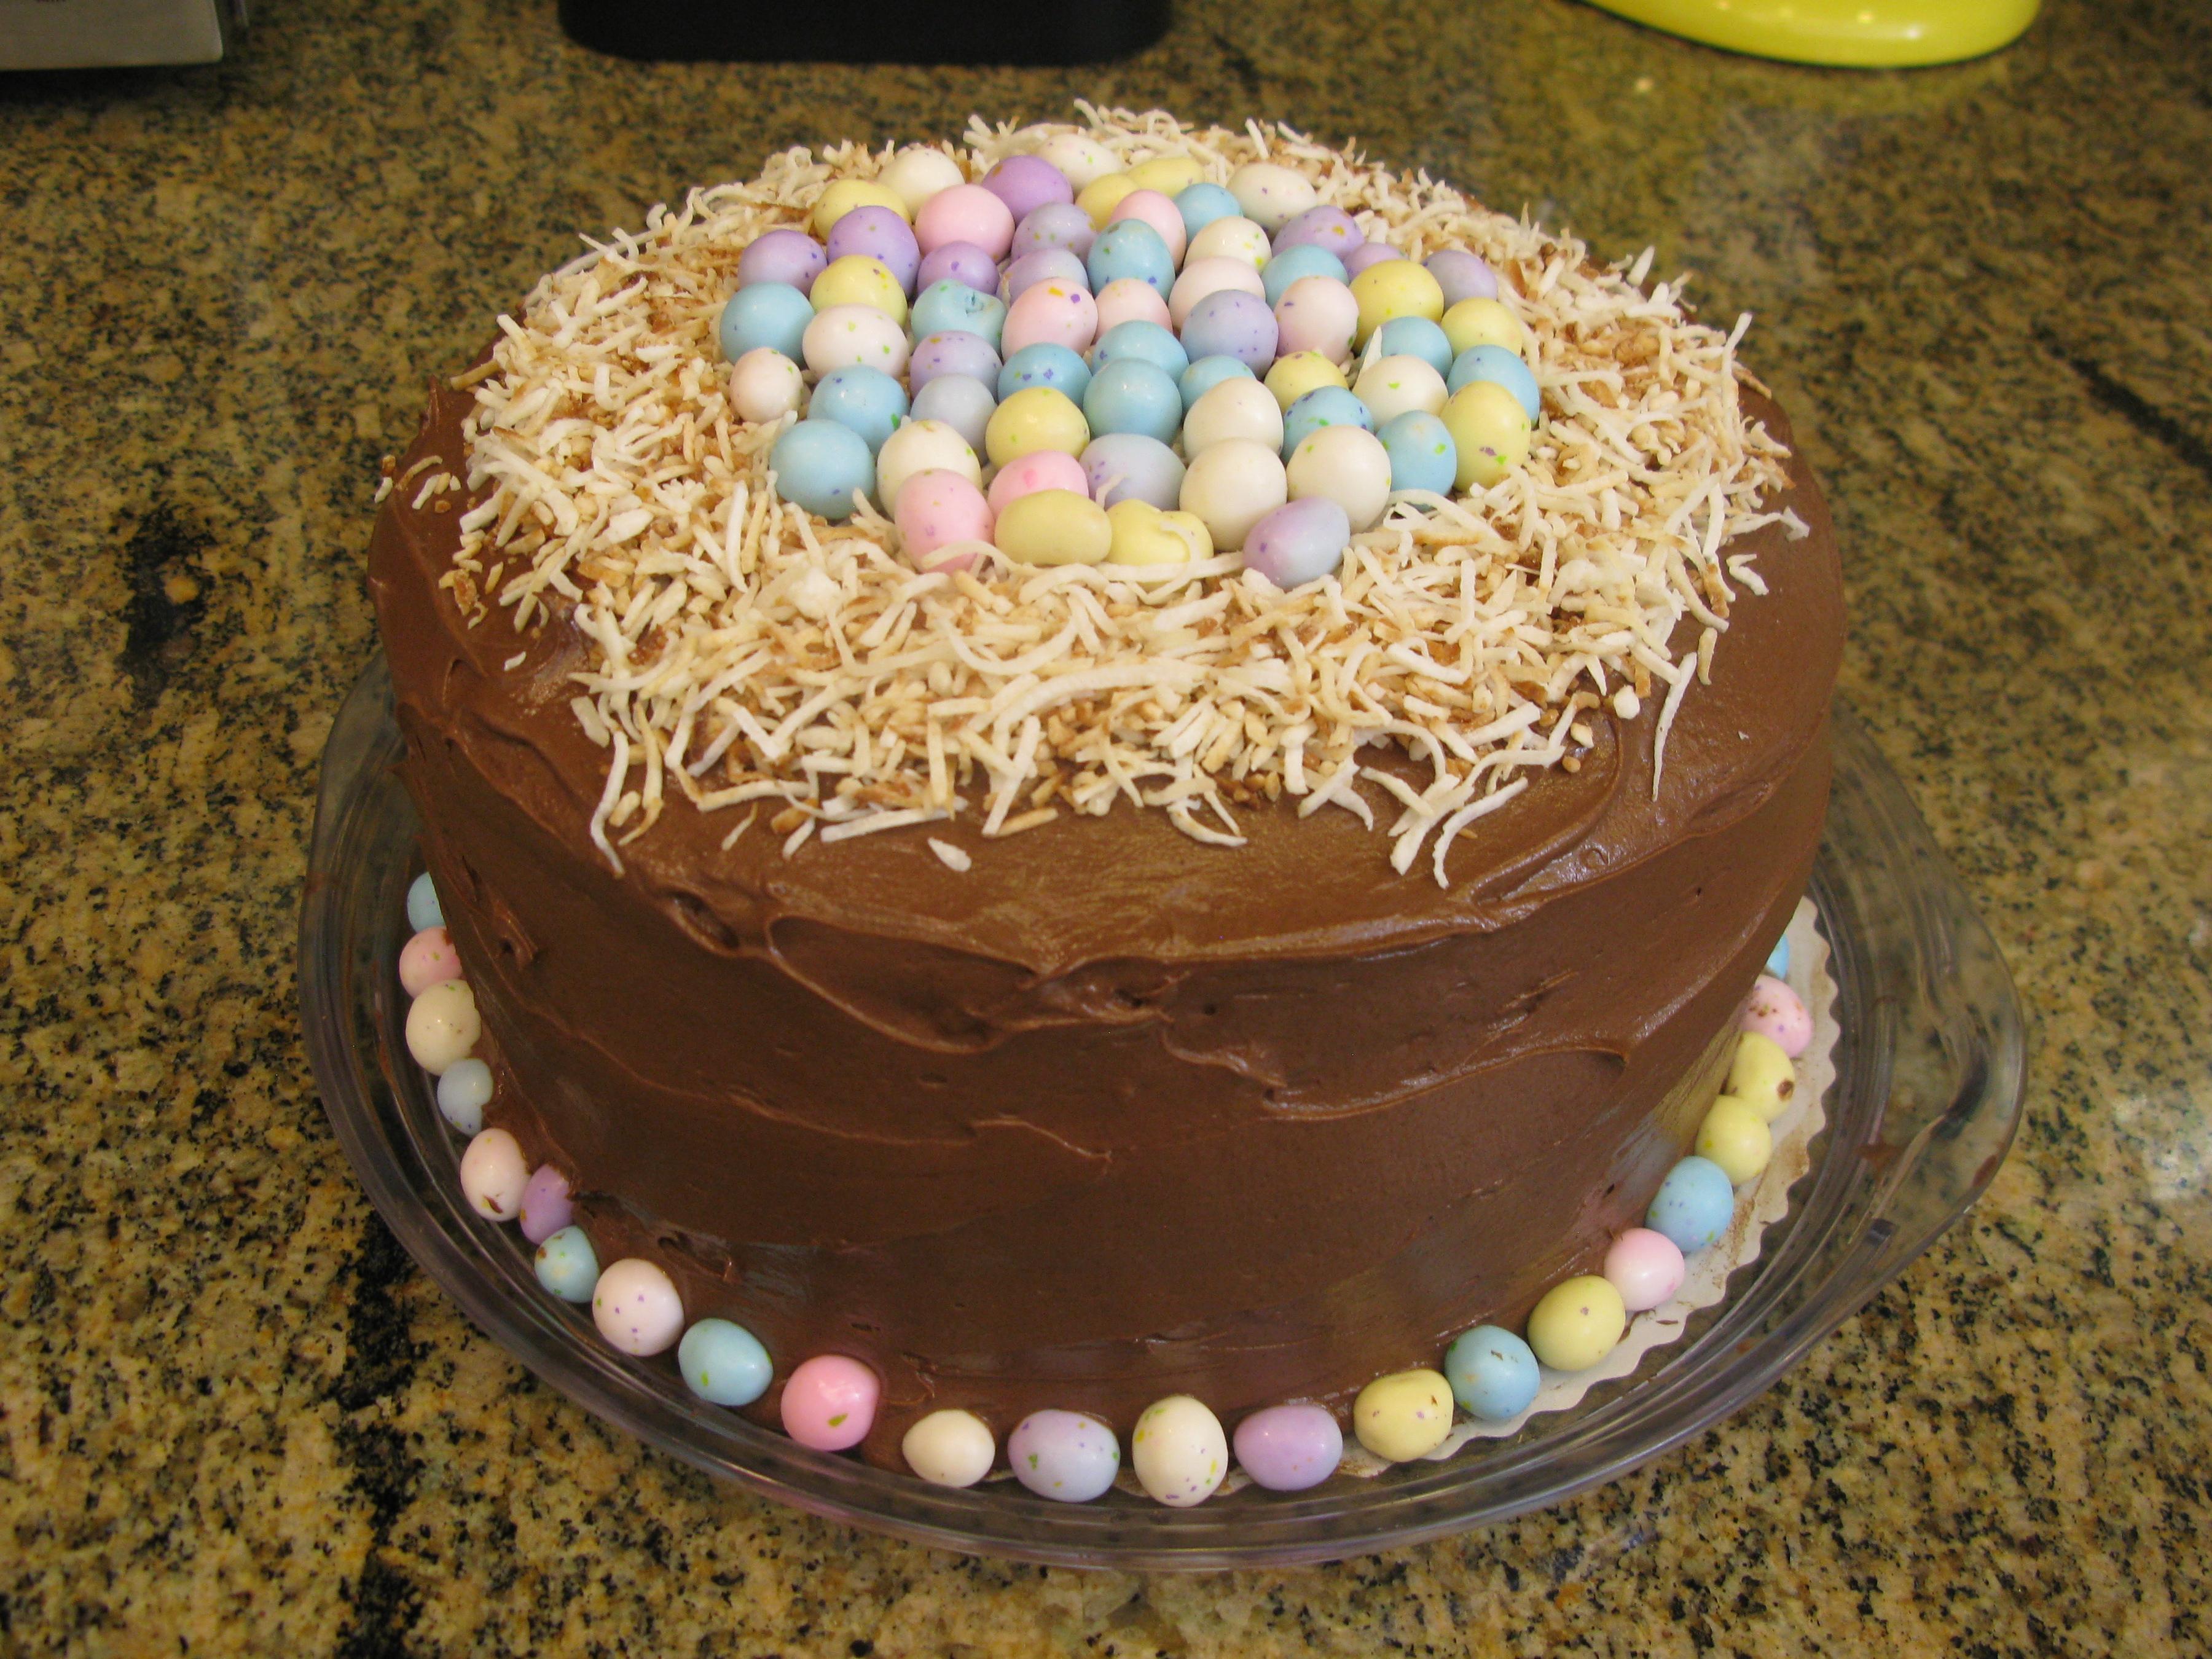 Recipe: Suzanne's Chocolate Cake Recipe